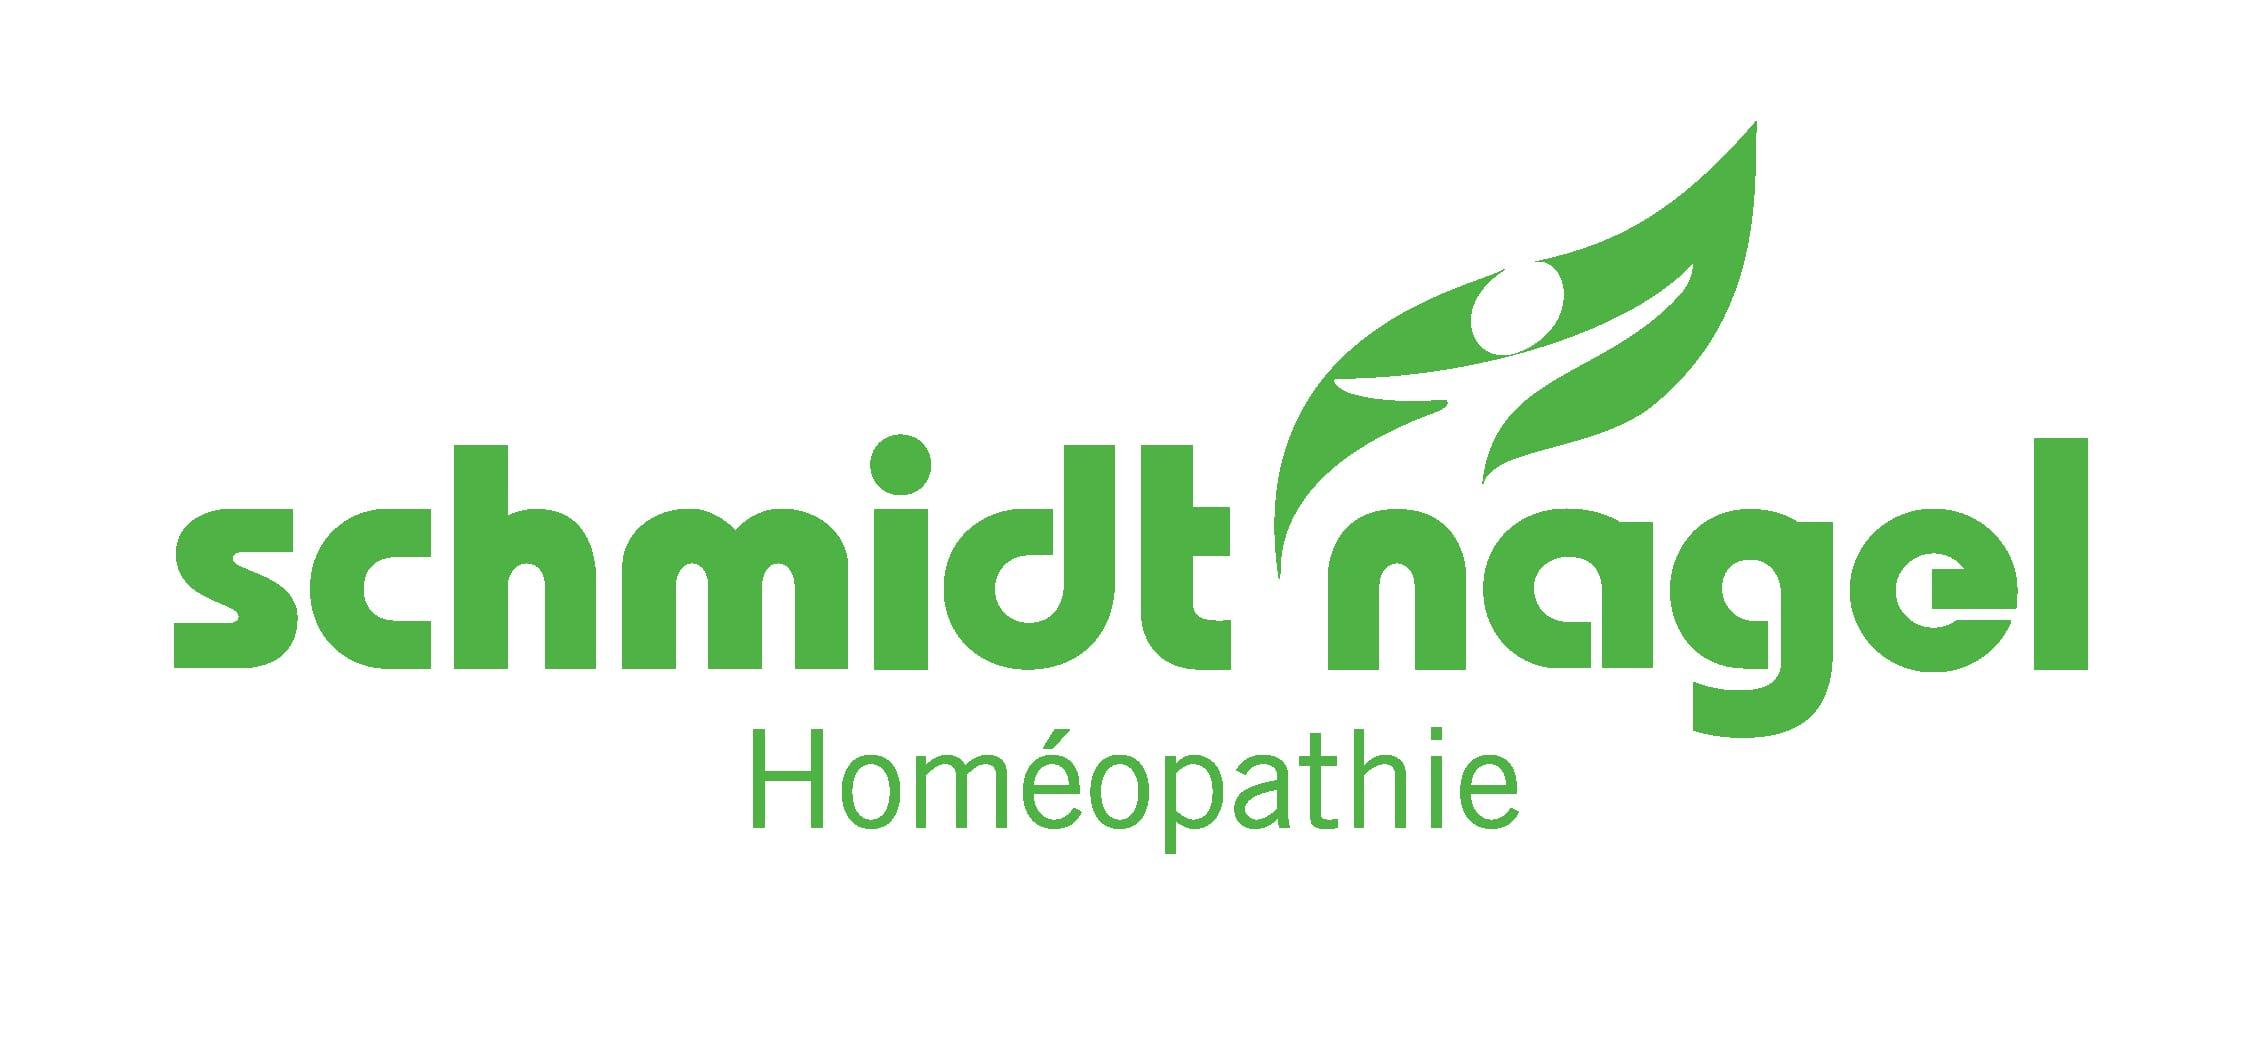 Schmidt Nagel Homeopathie